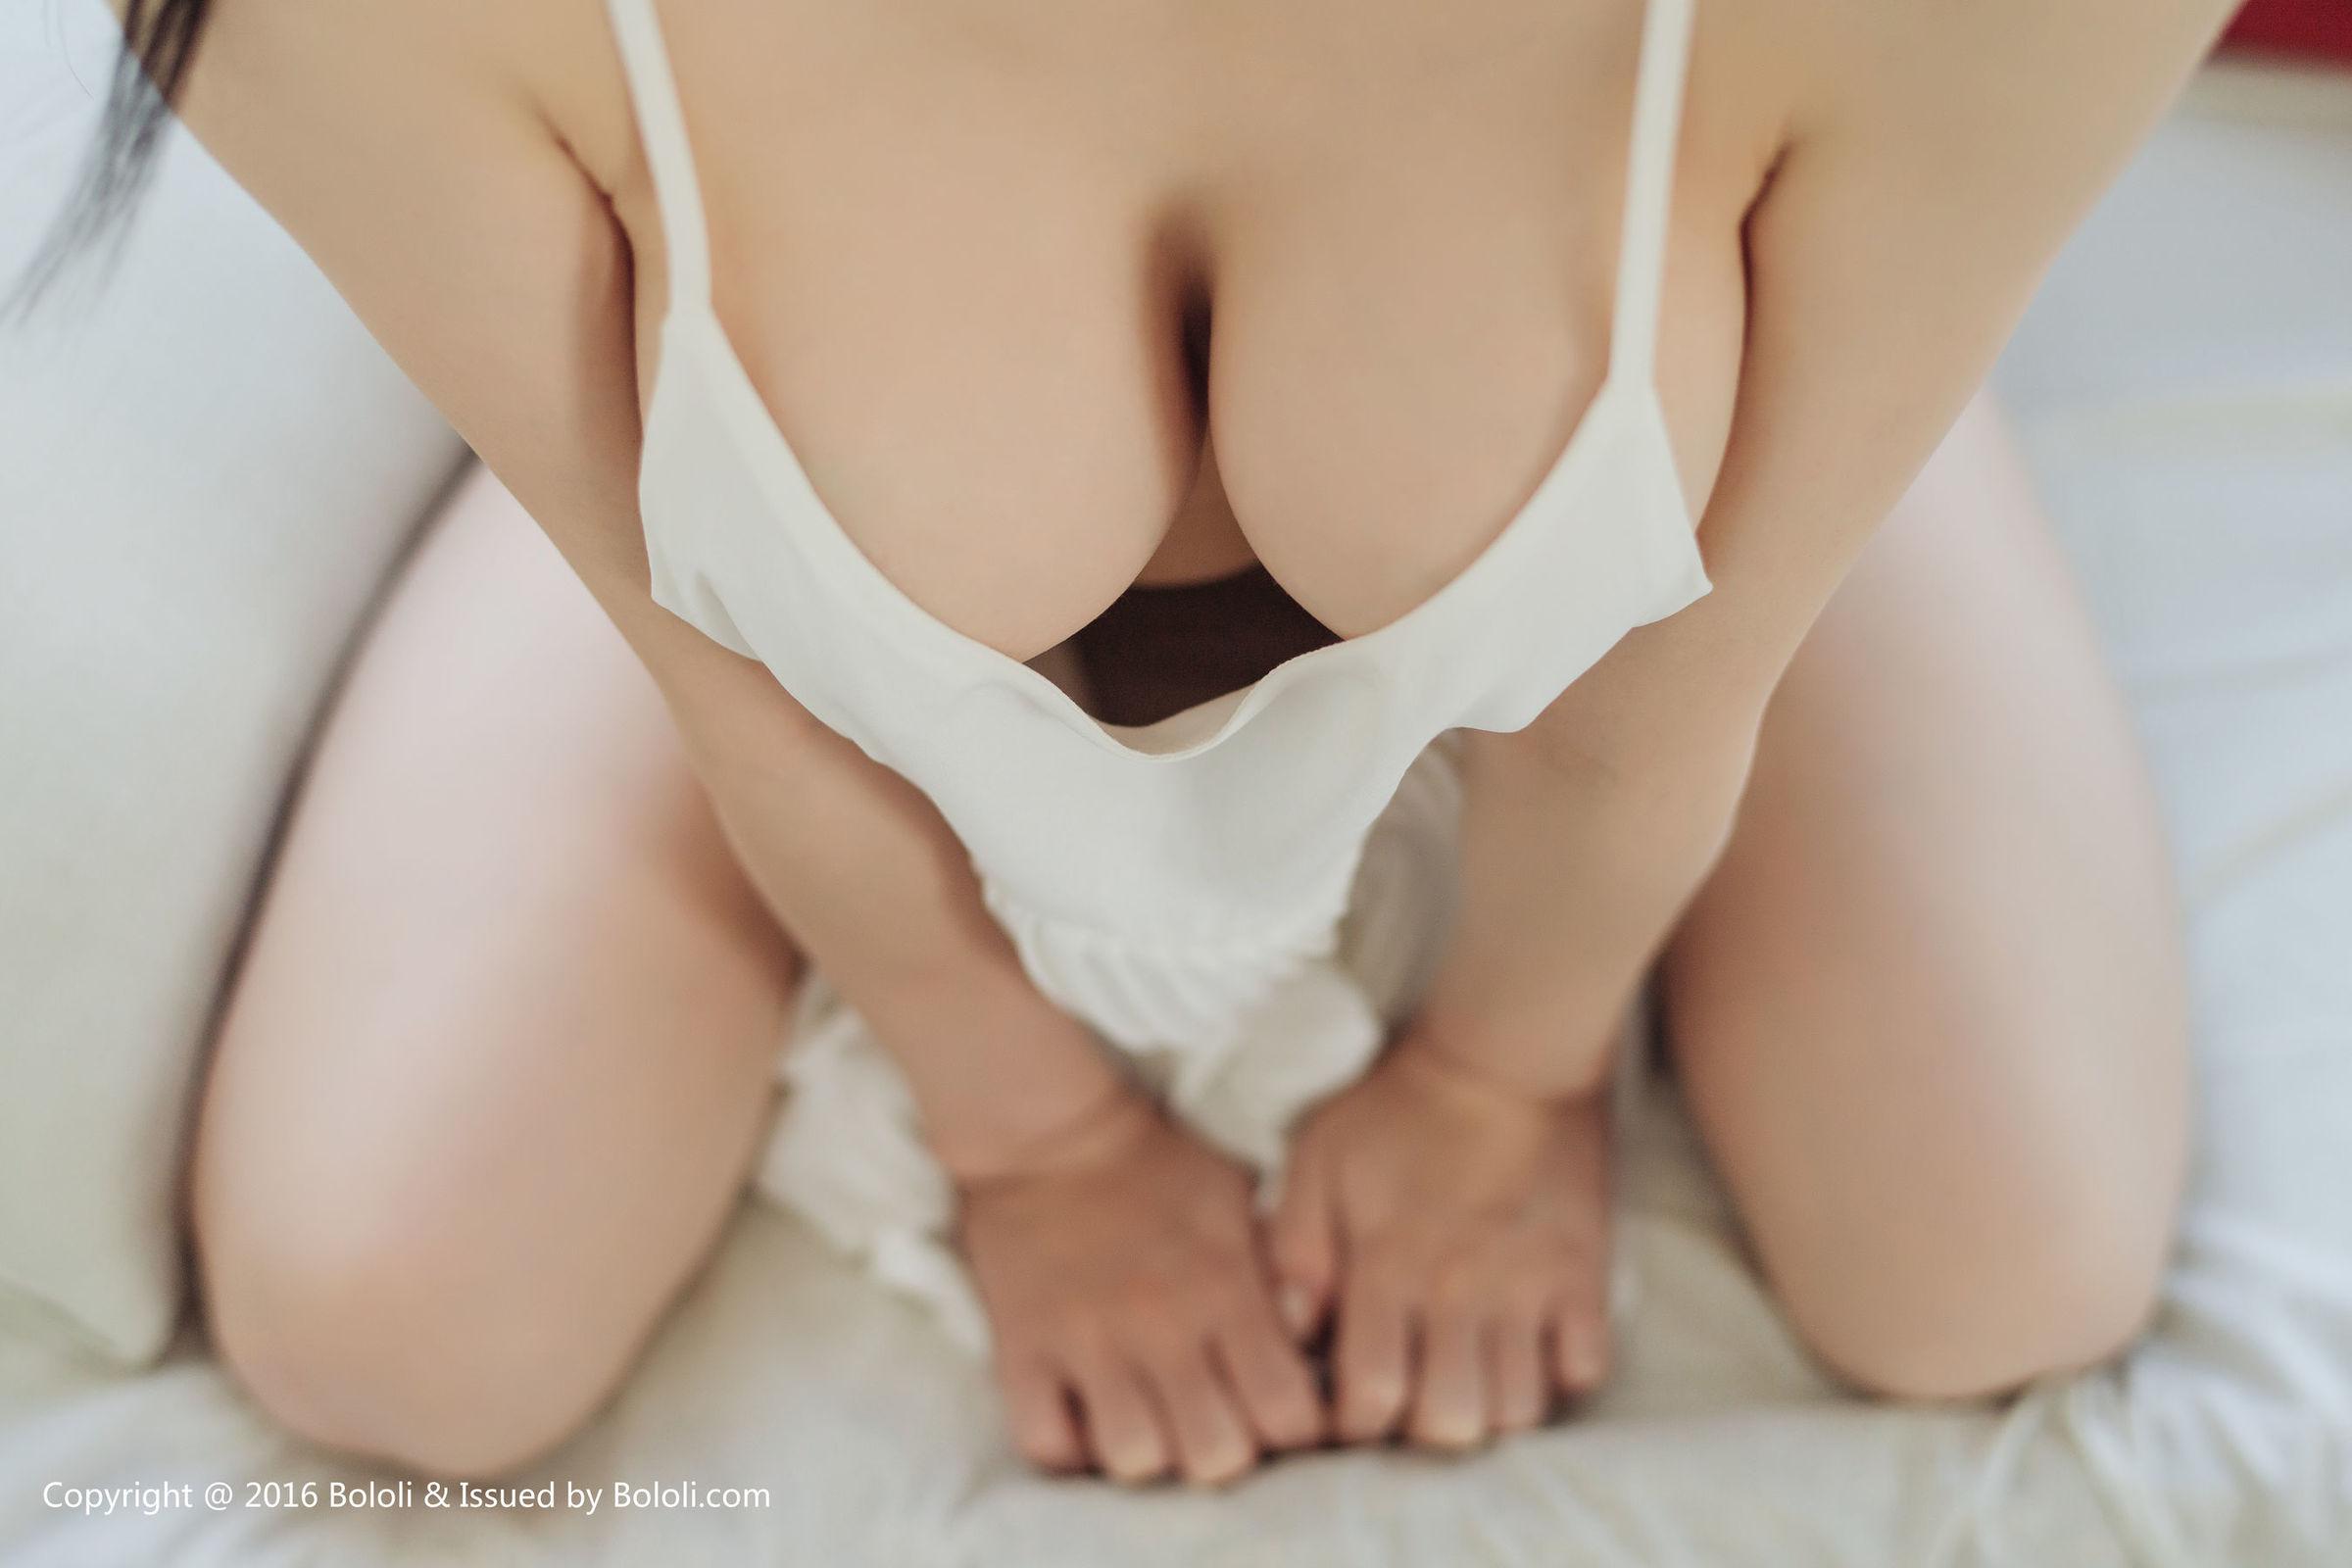 Bebe_Kim - 韩国Kim的唯美性感